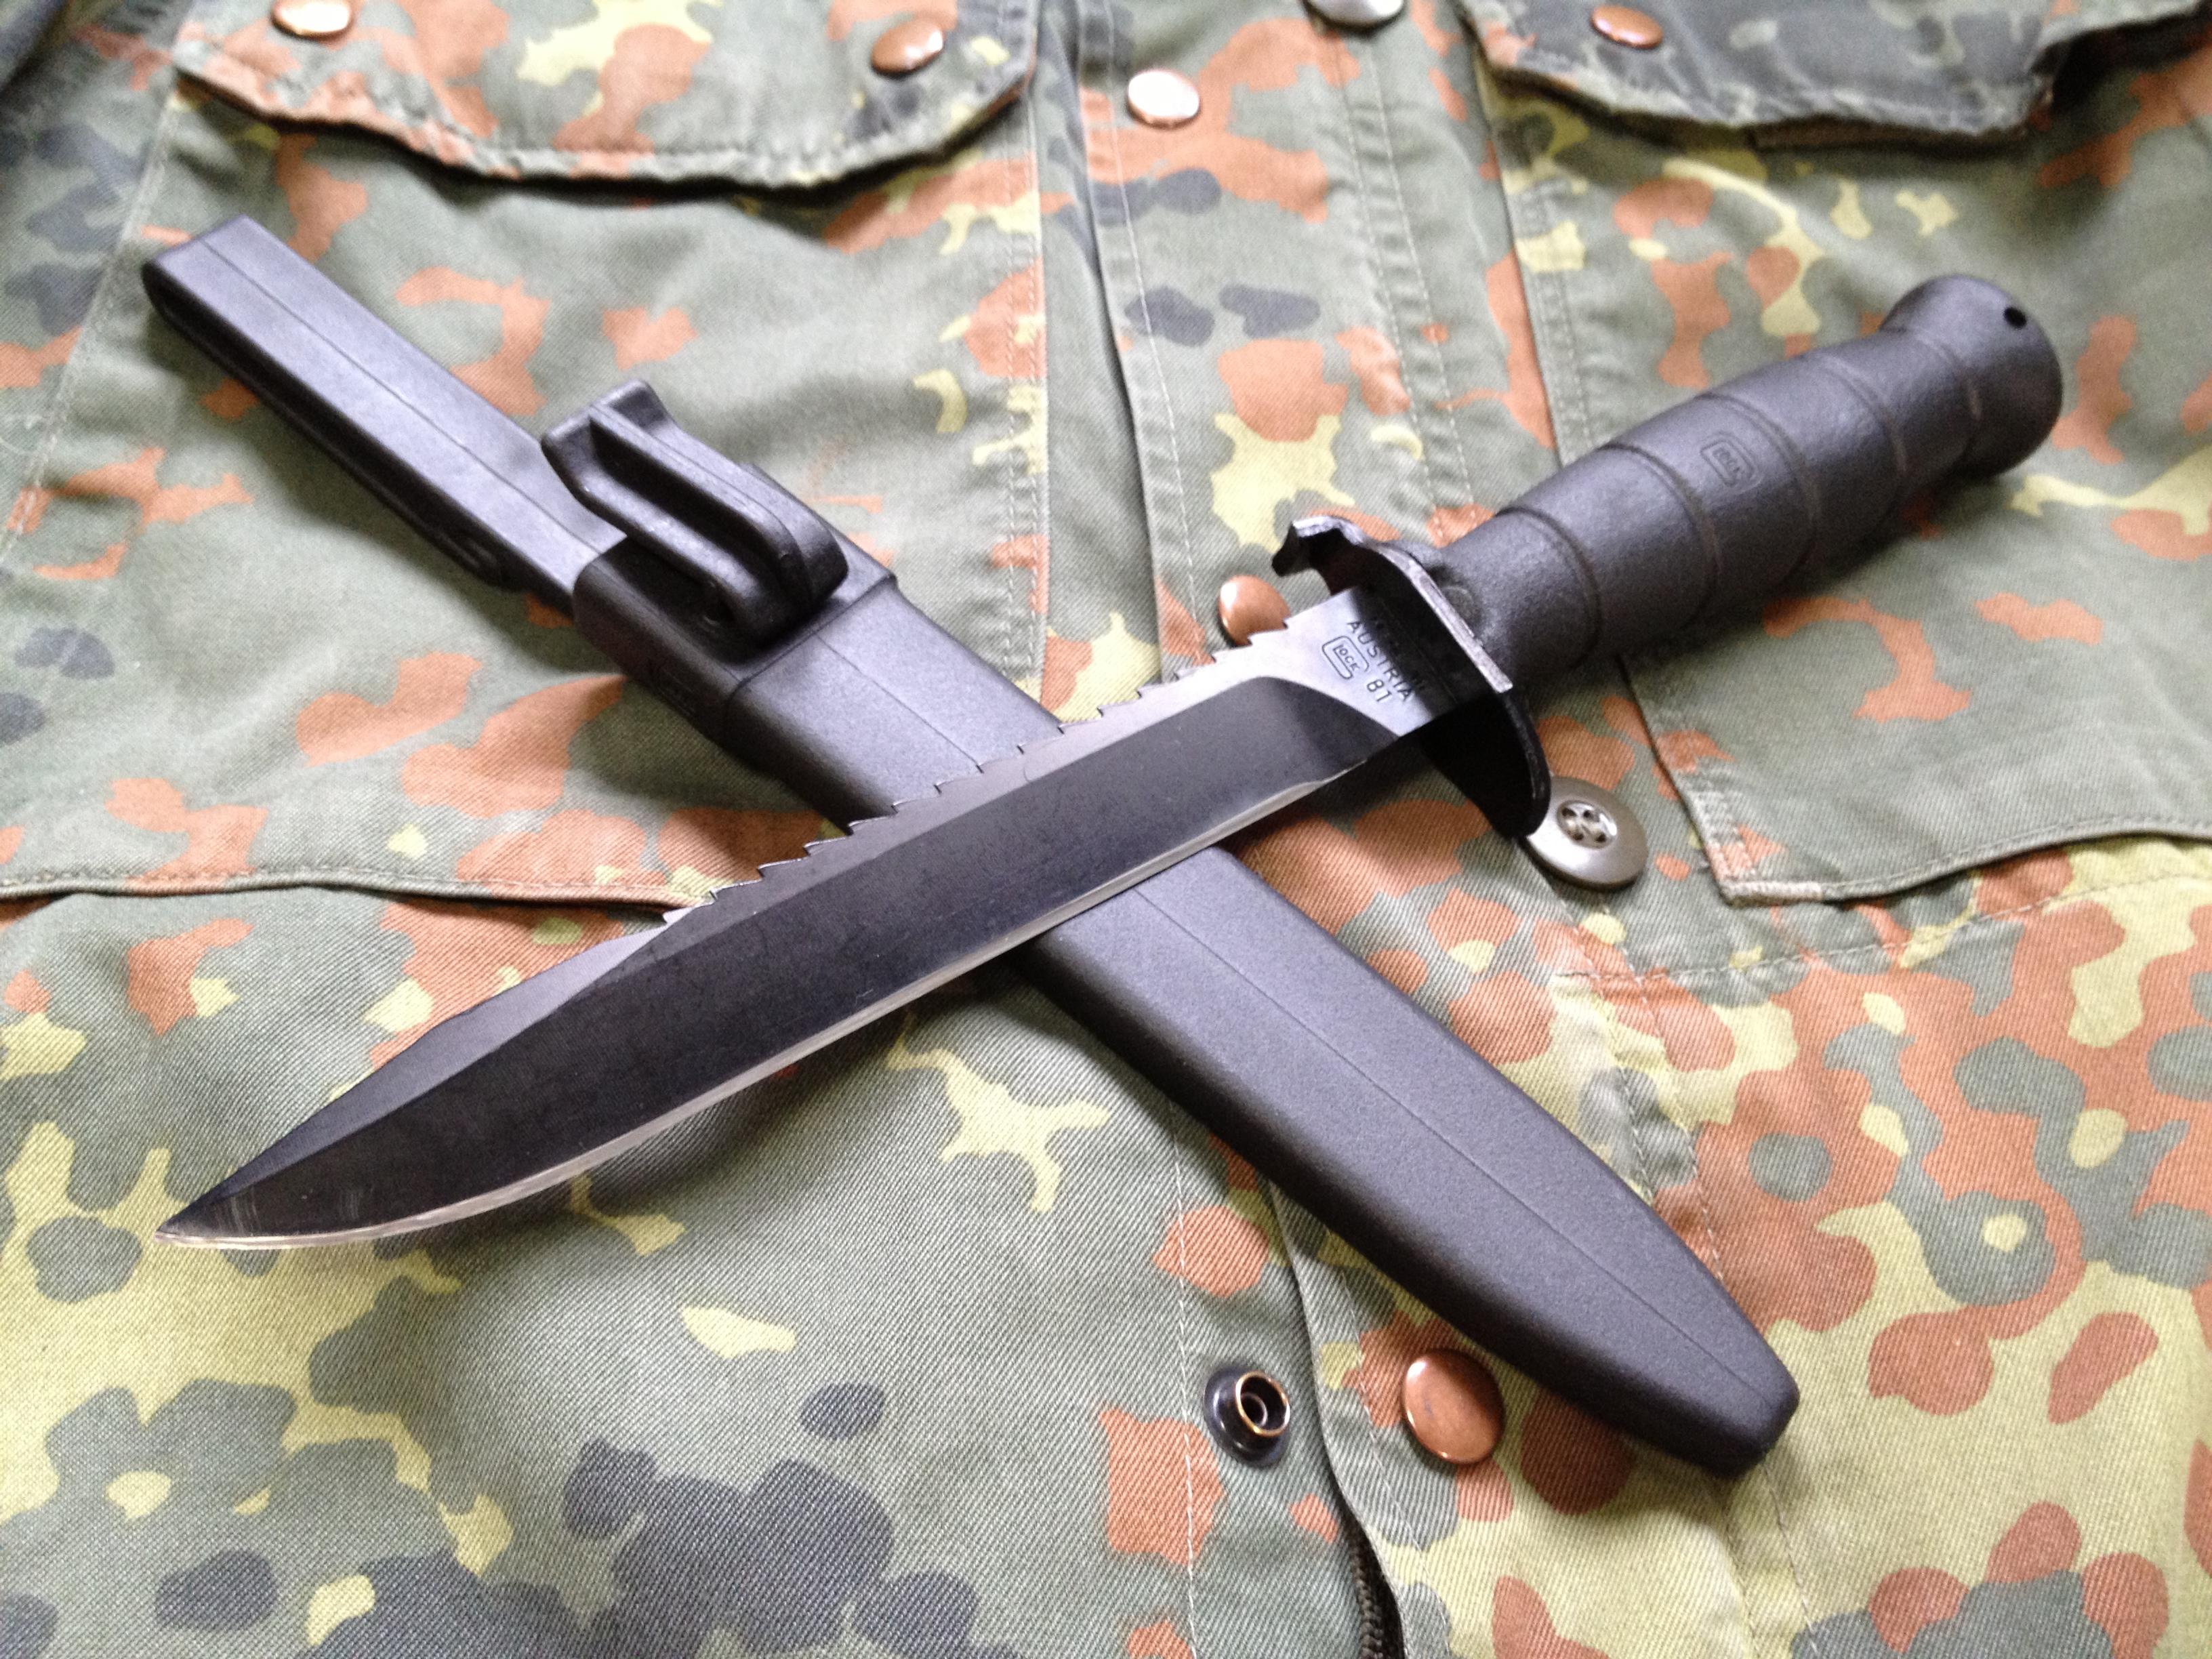 Нож Cold Steel Survival Edge Black CS/80PHBZ - длина лезвия 126мм